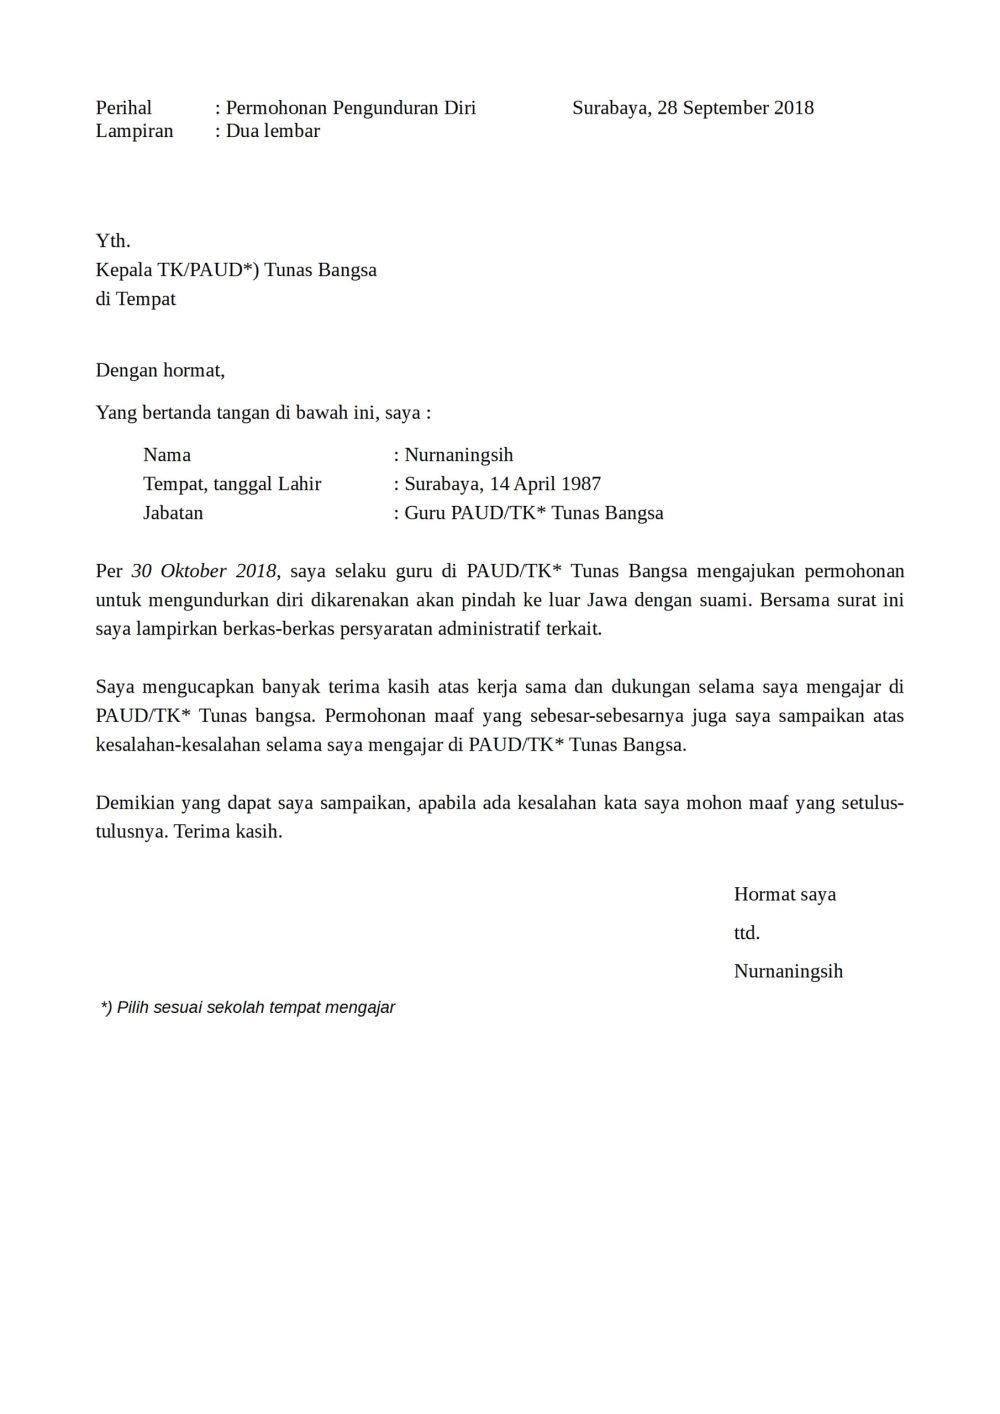 11. Contoh Surat Pengunduran Diri Guru Sekolah